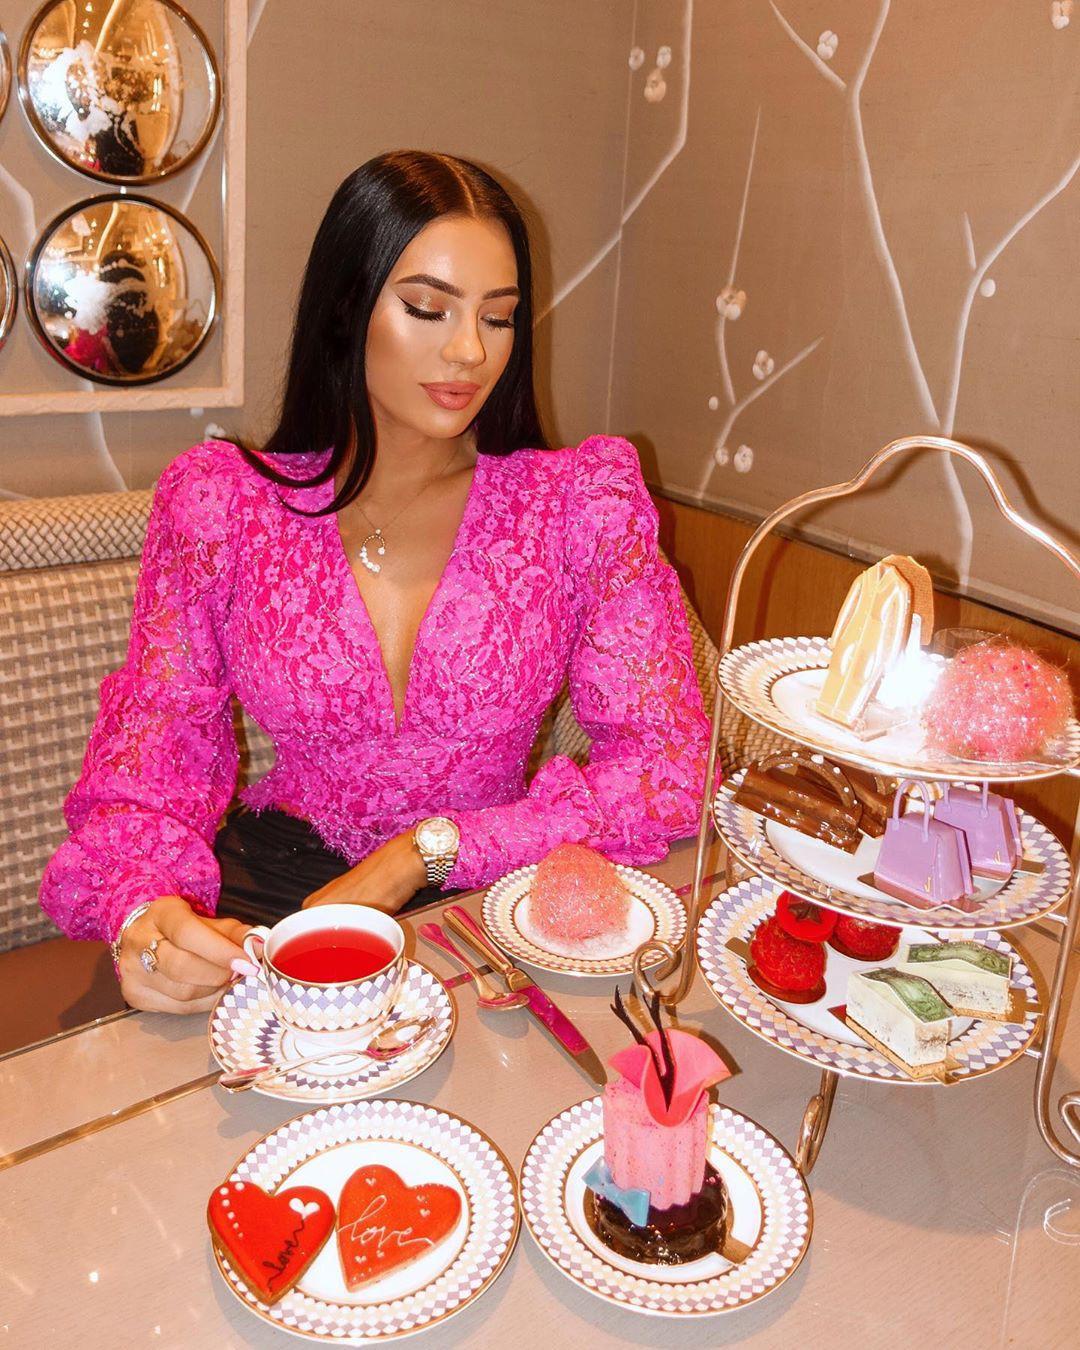 Klaudia Badura, dessert, magenta, sitting